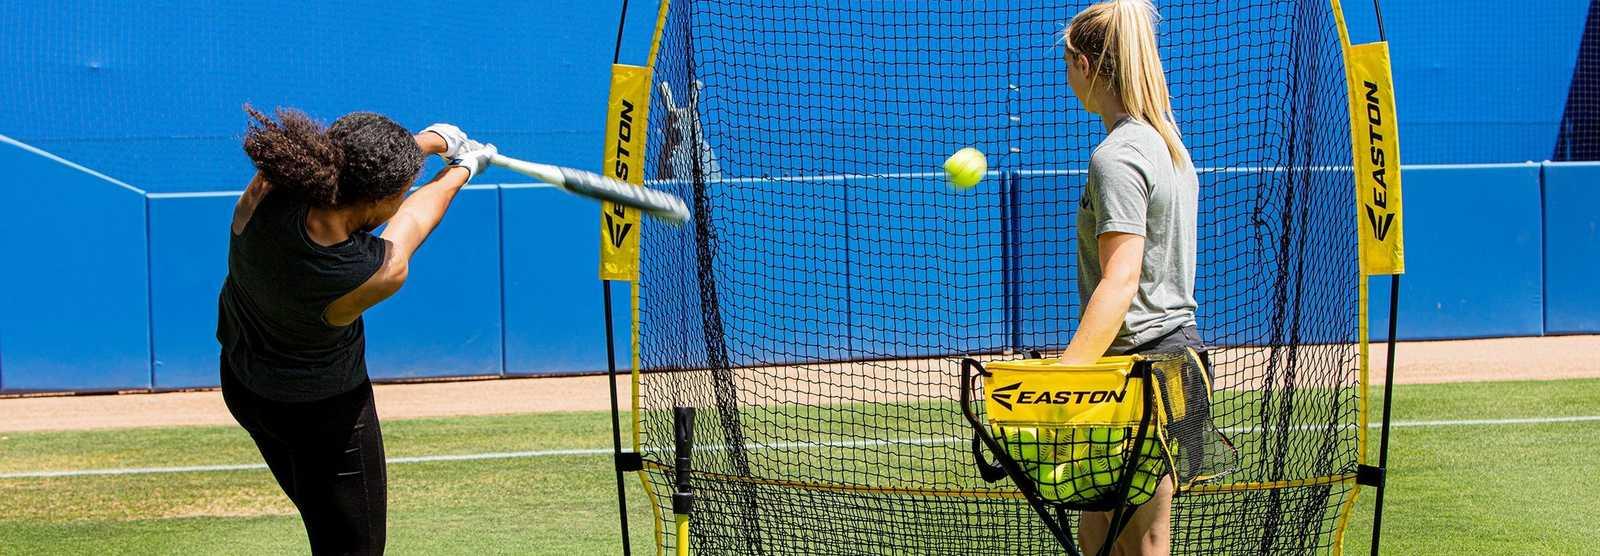 baseball-softball-nets-screens-accessories